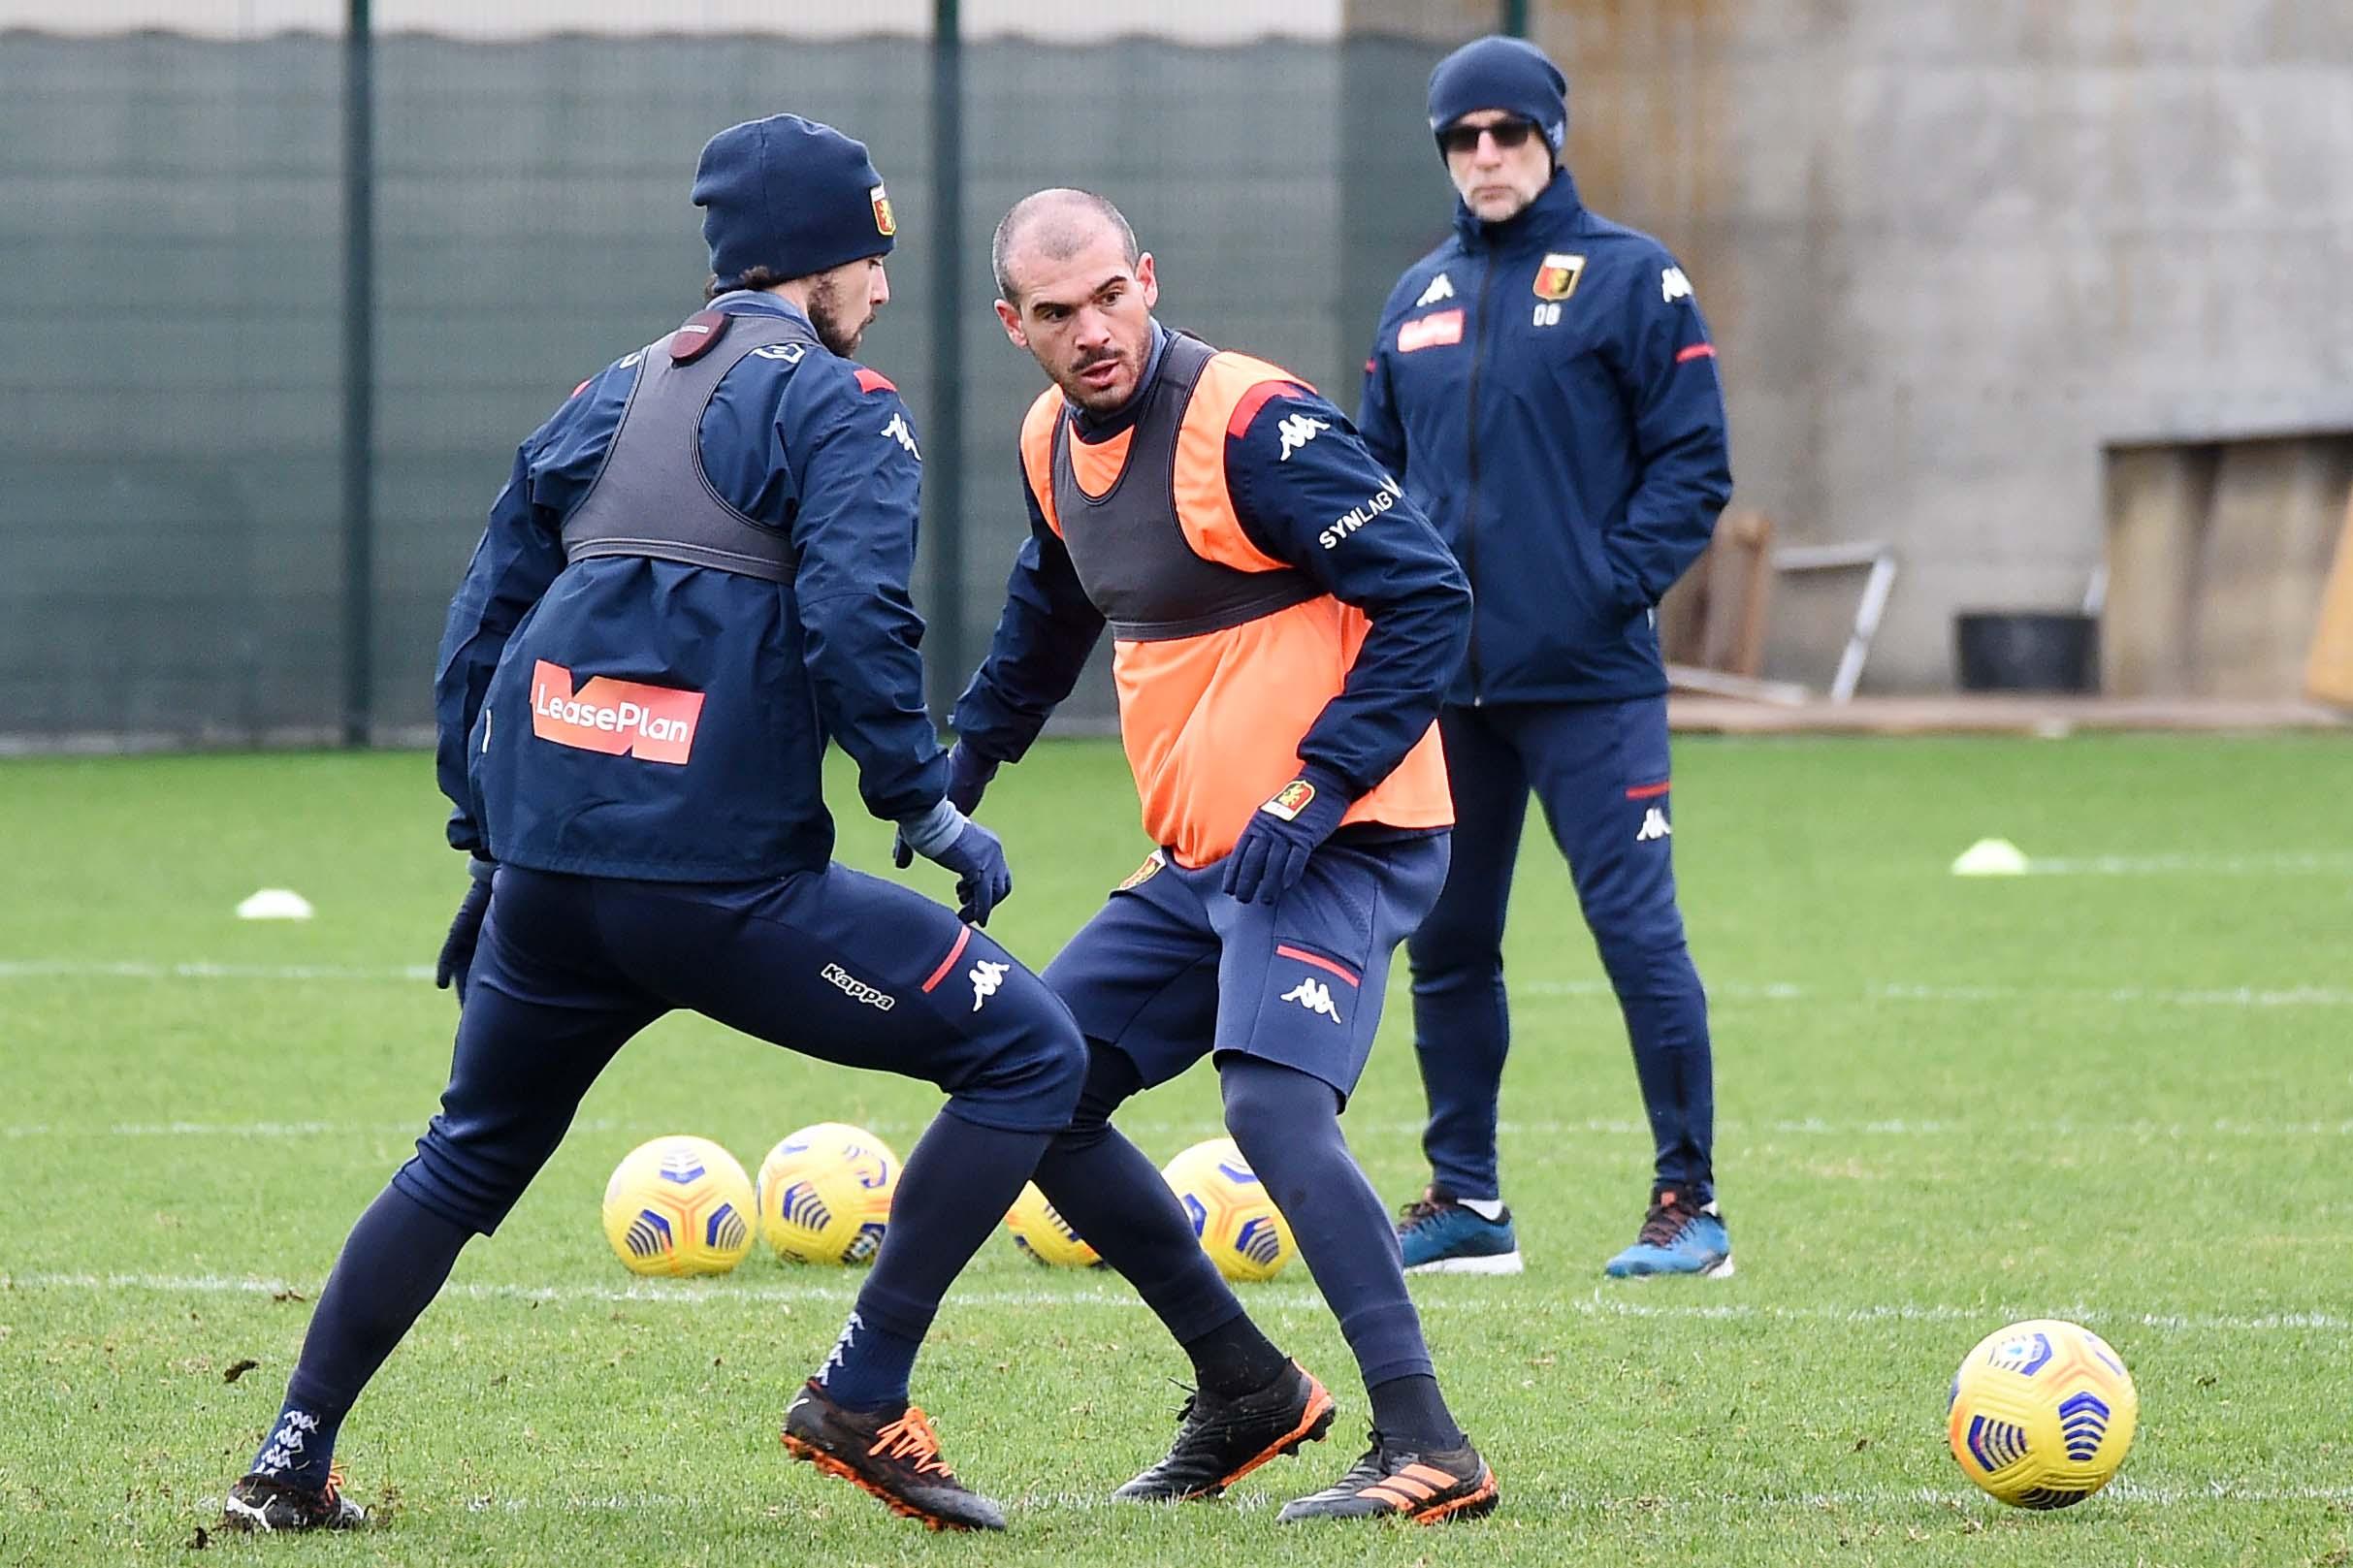 Ballardini Sturaro Genoa